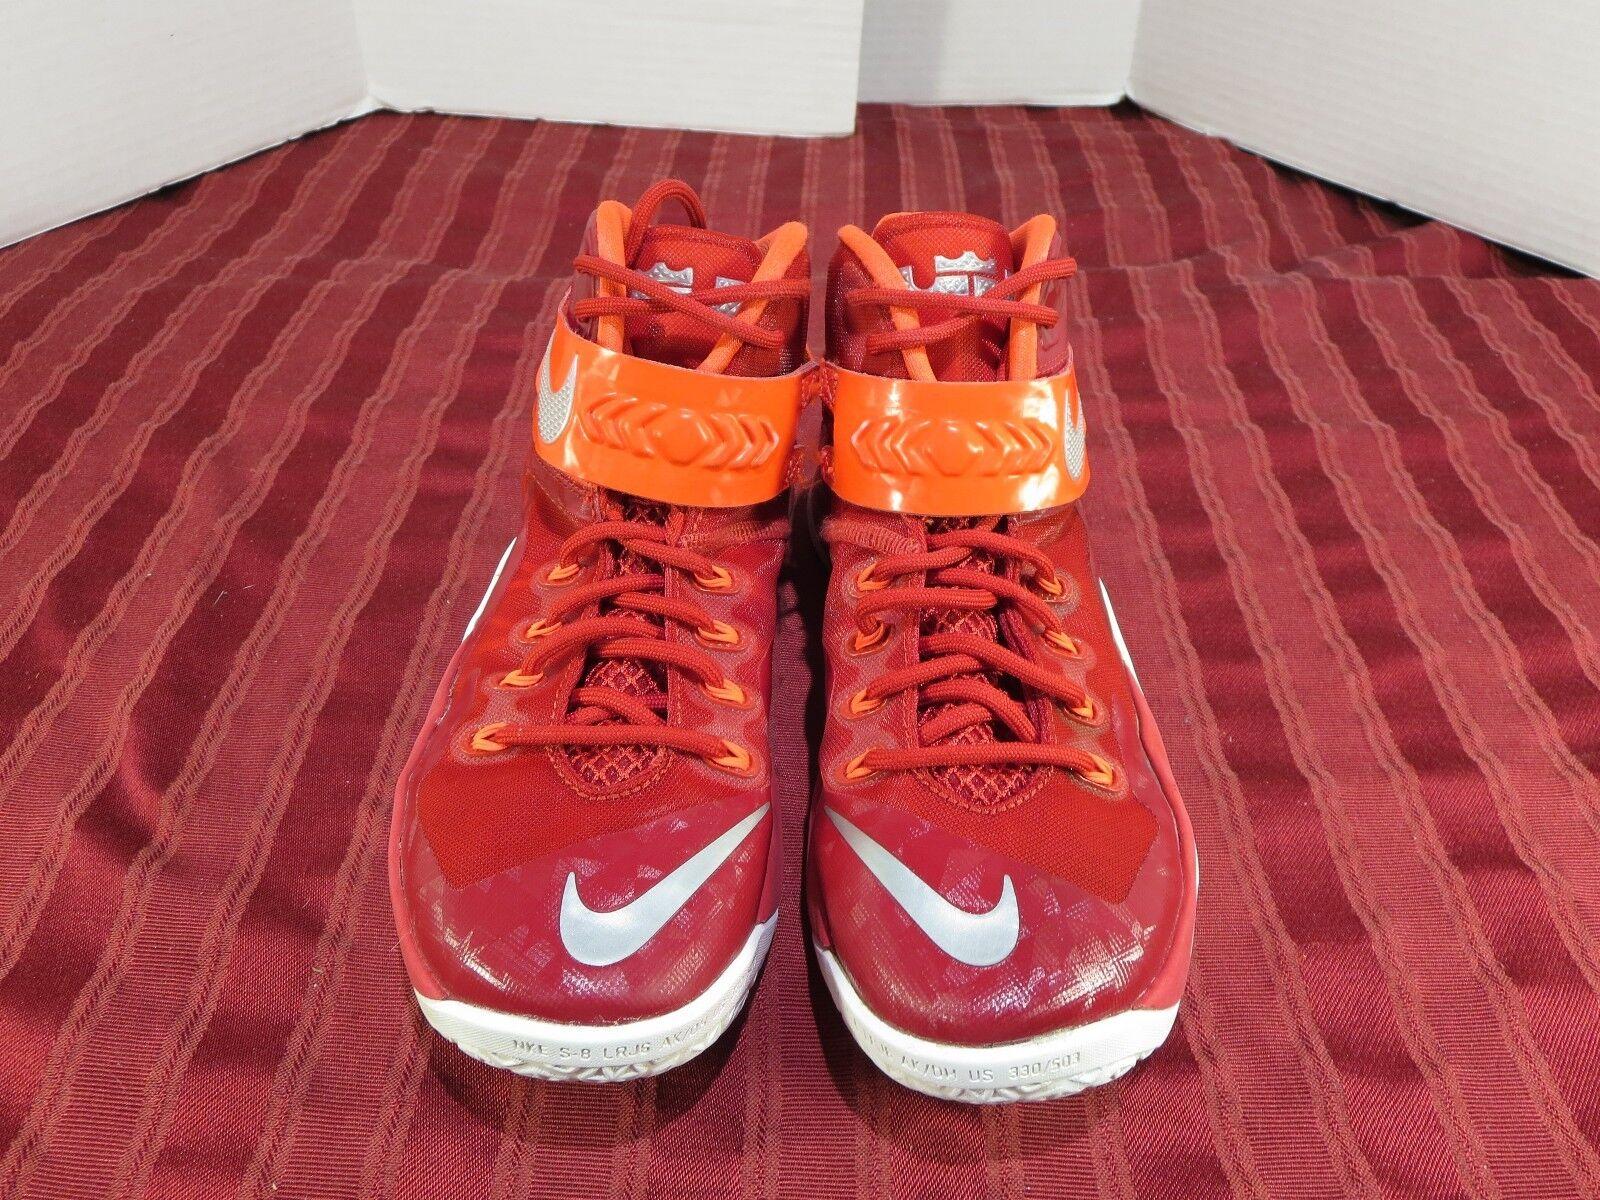 Nike Zoom zapatos Soldier VIII TB Basketball Athletic cremallera 653648-606 zapatos Zoom hombre SZ 7,5 977572